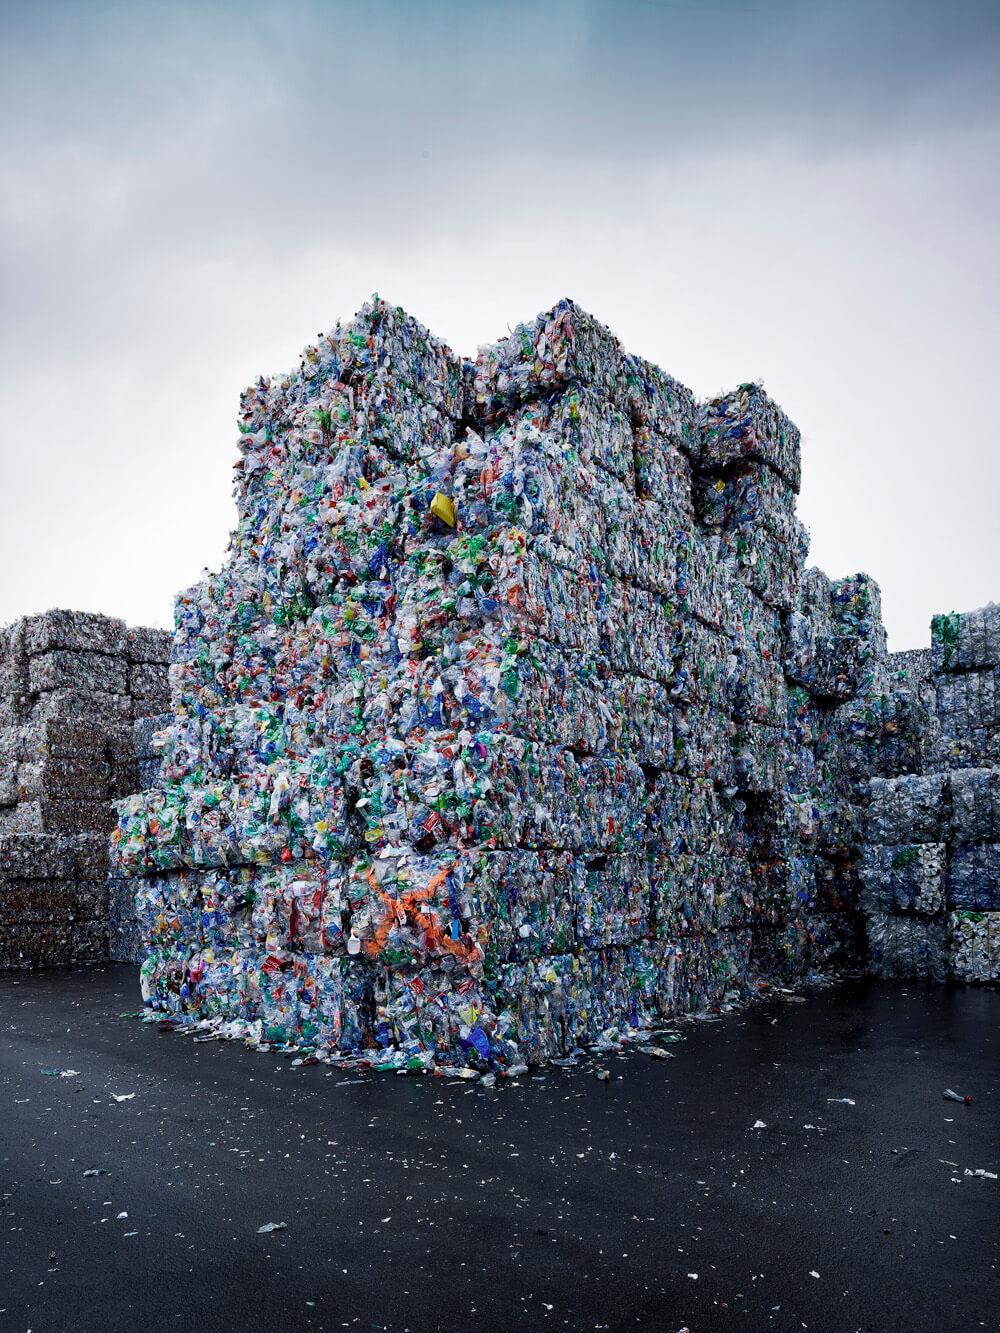 Bertschi Recycling